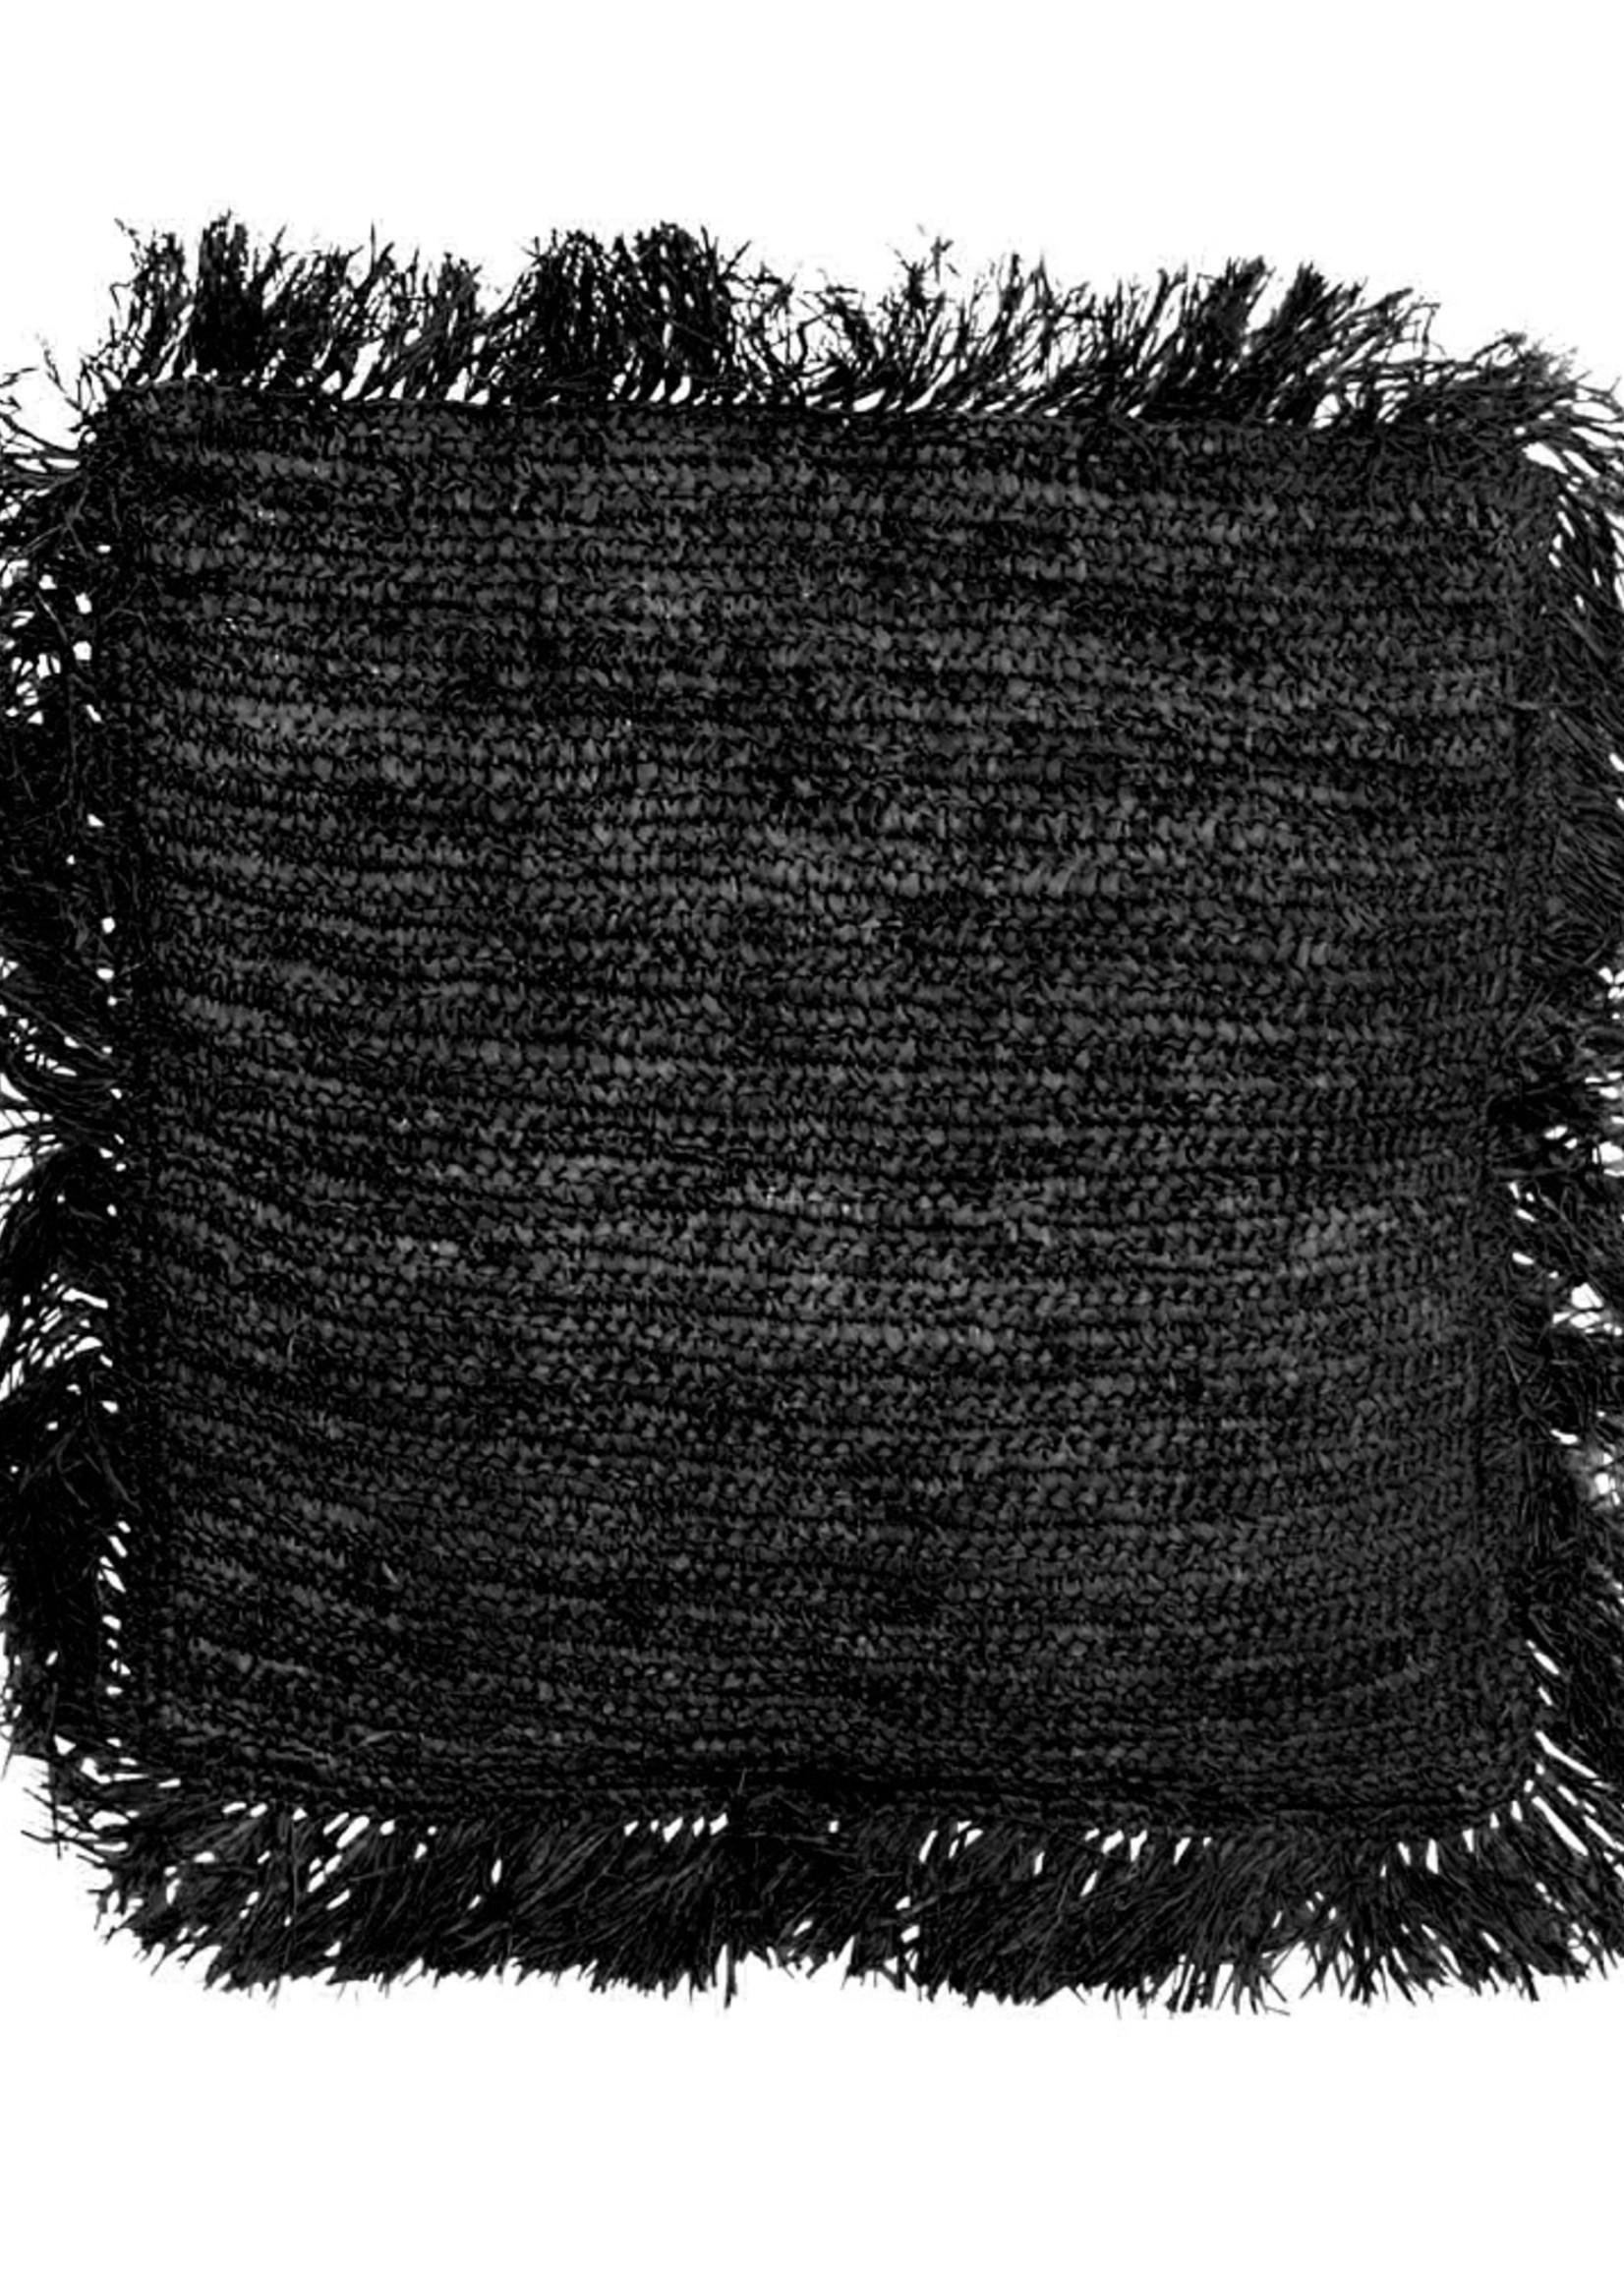 The Raffia Cushion Square - Black - L